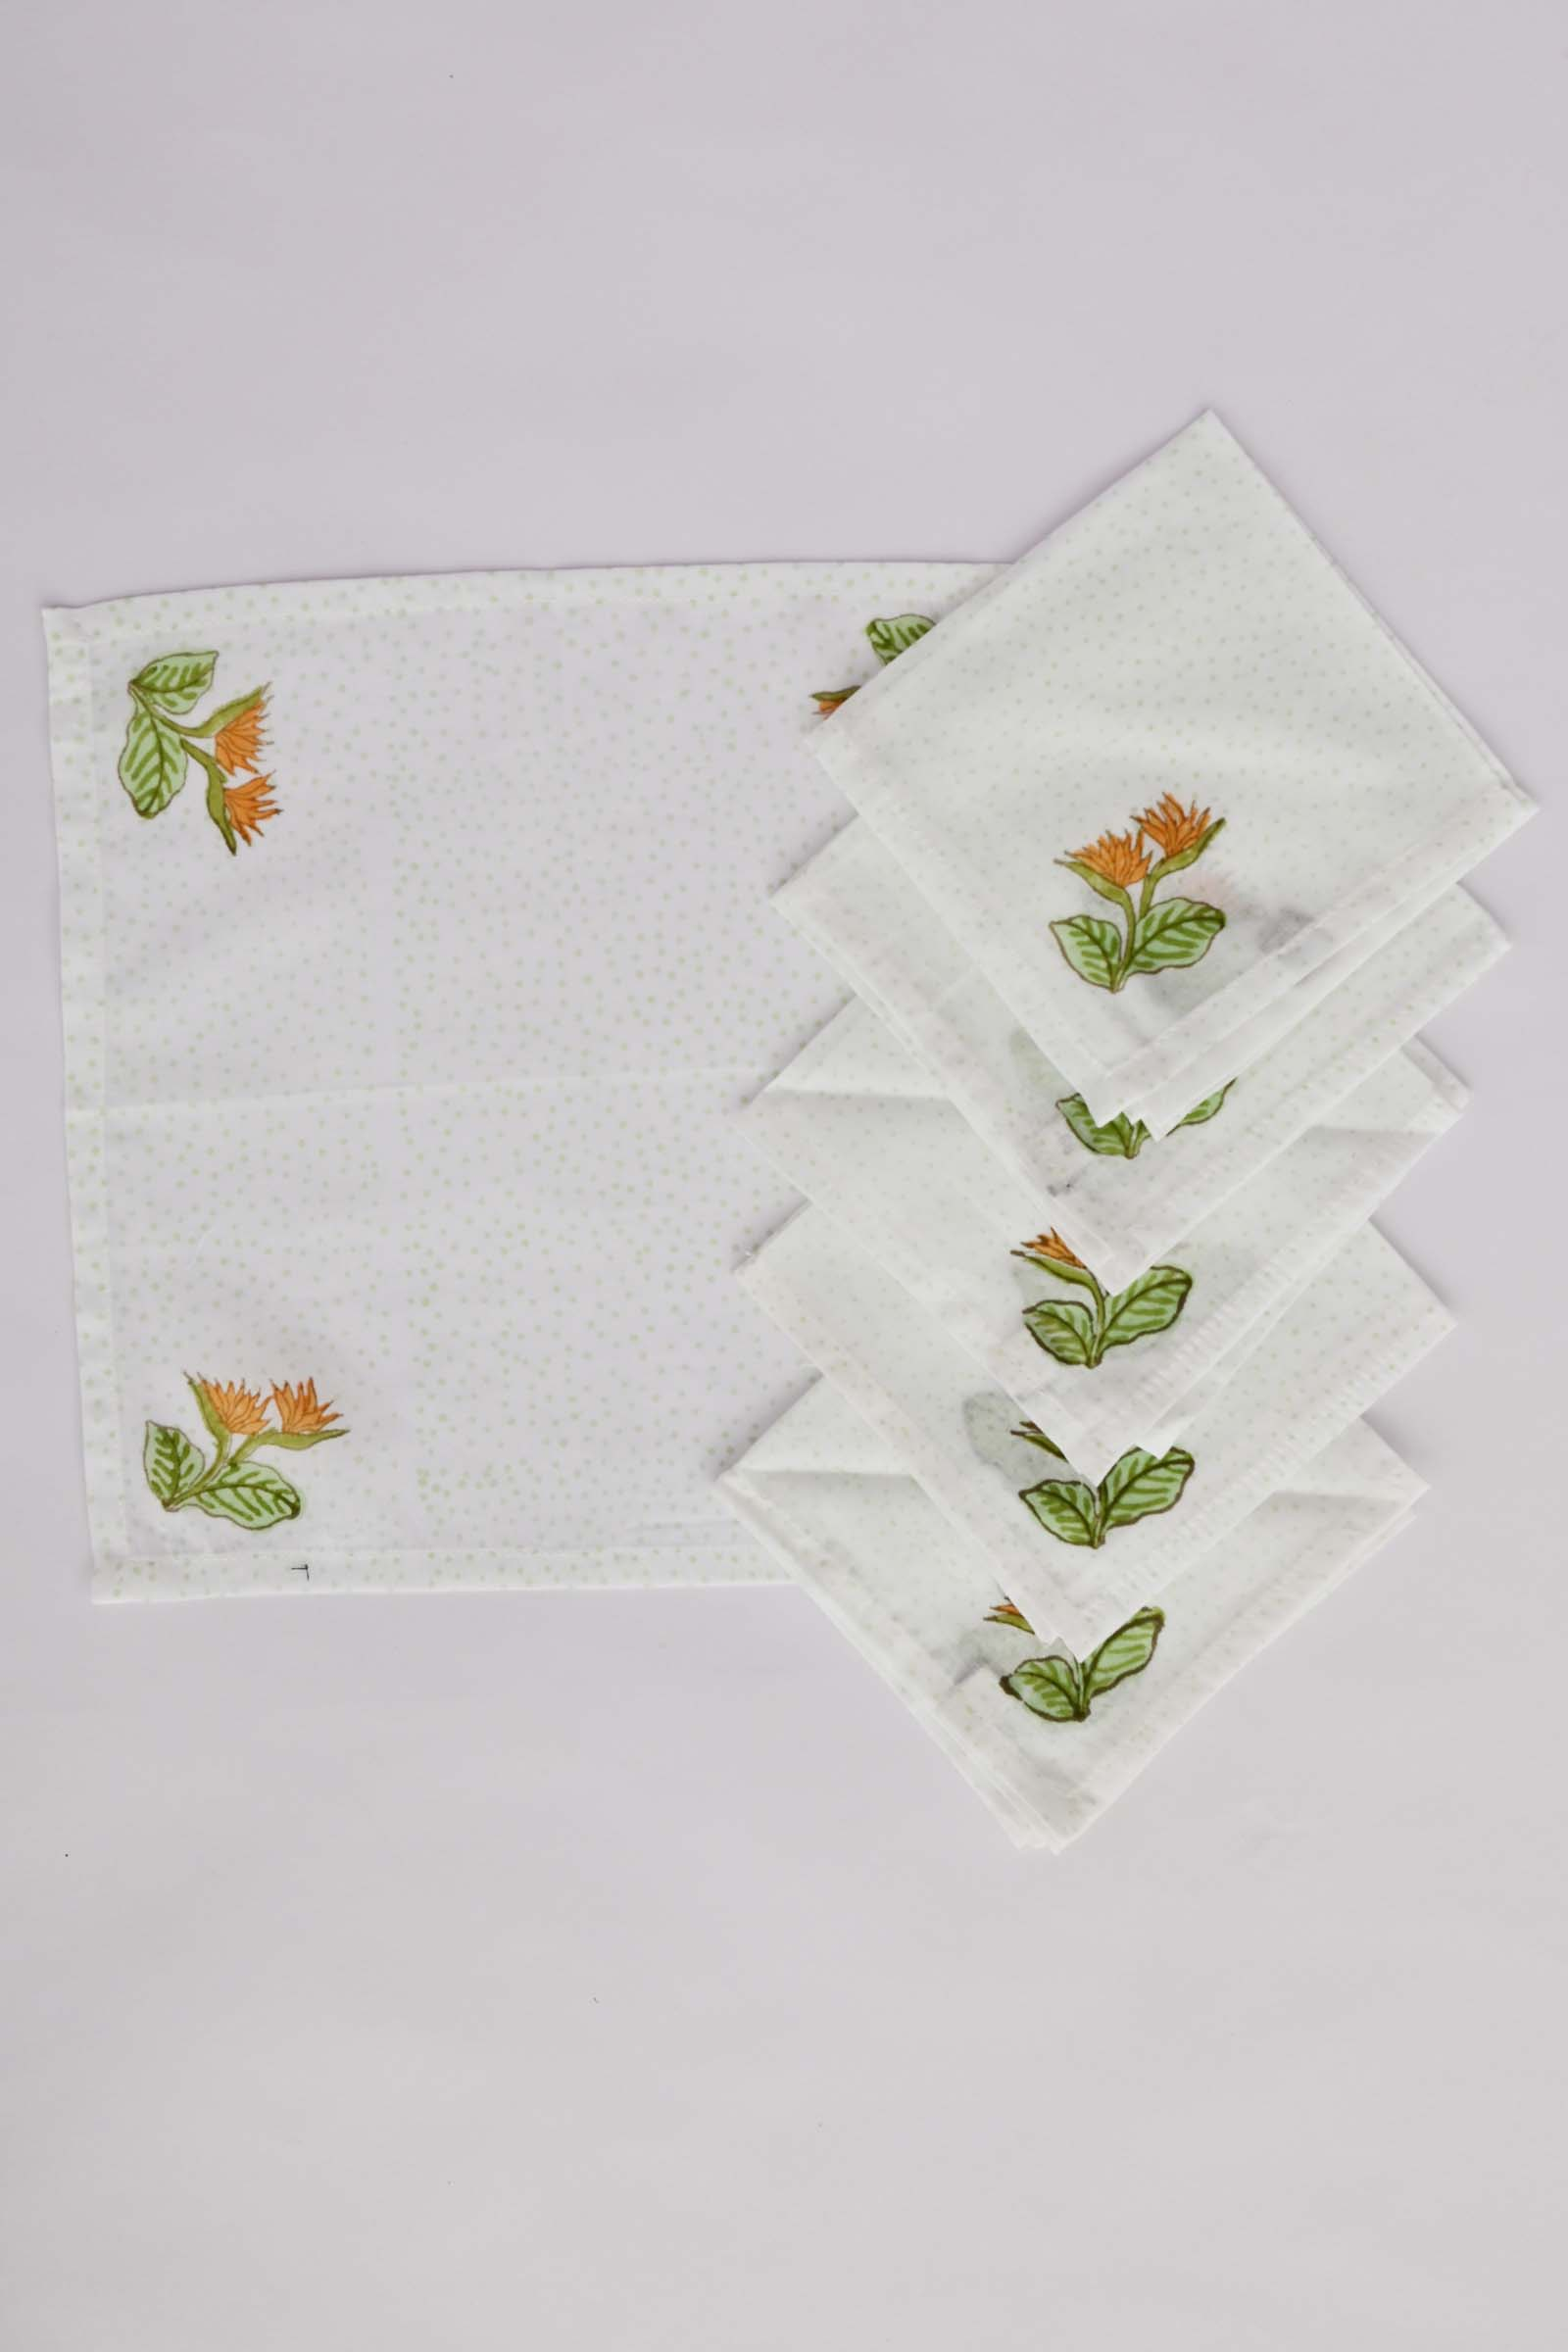 Bird Of Paradise Floral Printed Tea Napkin Set Of 6